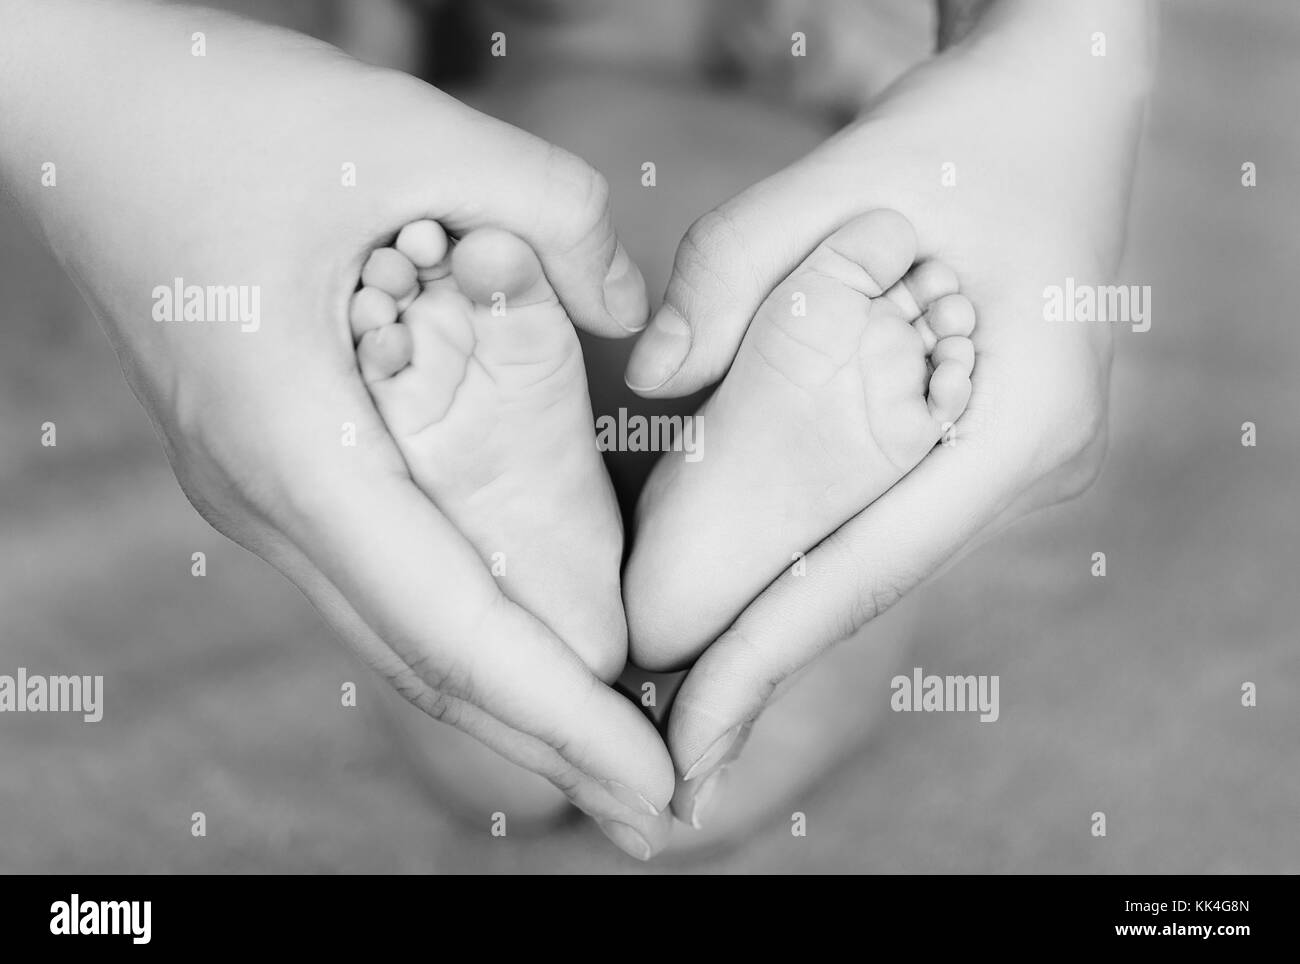 heels of newborn in mother hands forming a heart - Stock Image